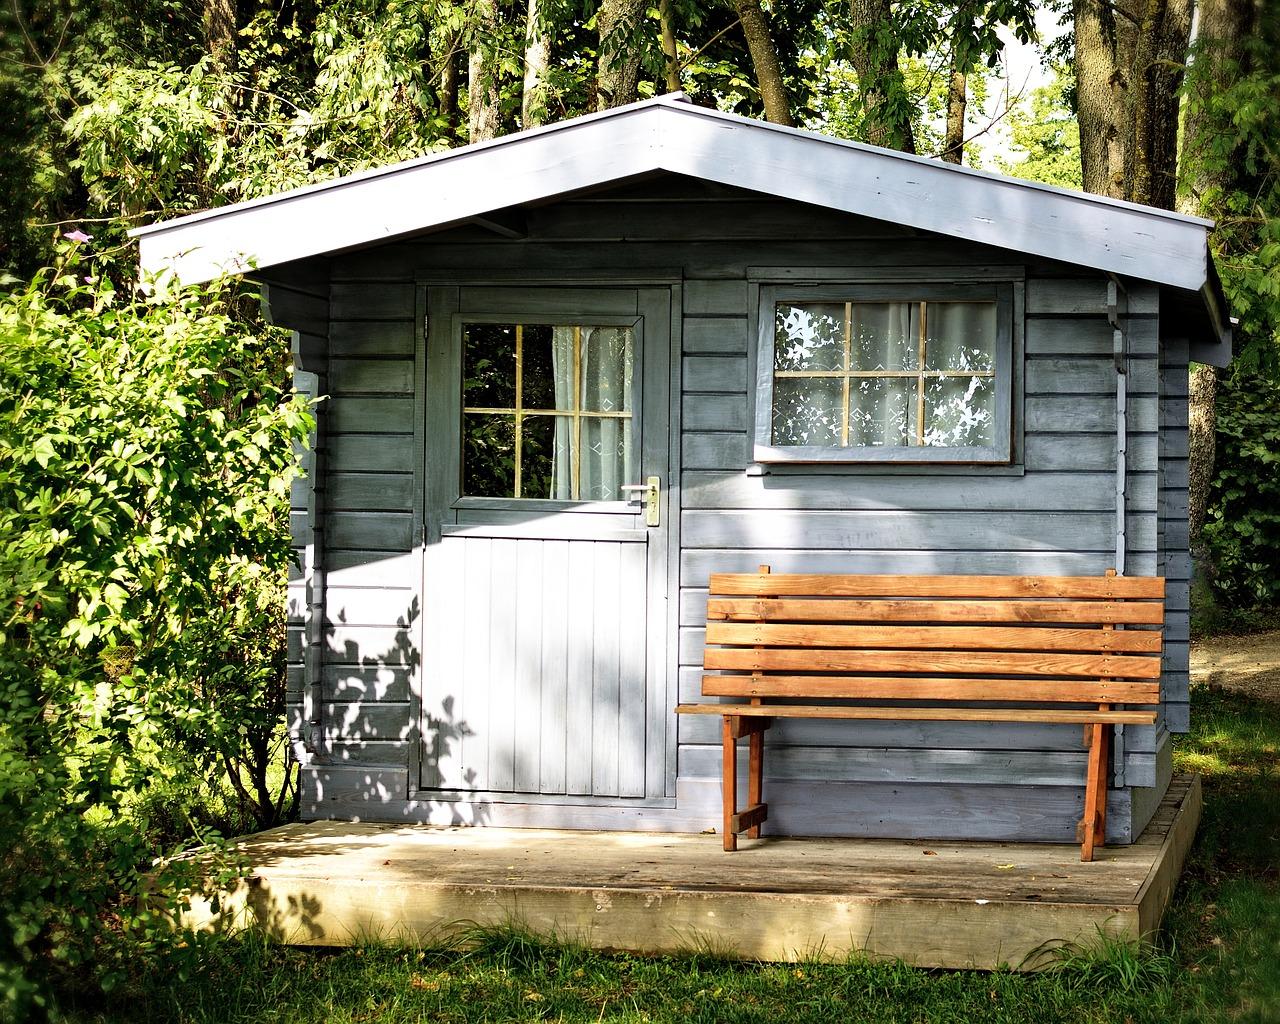 Ein Klassiker: Gartenhäuser aus Holz